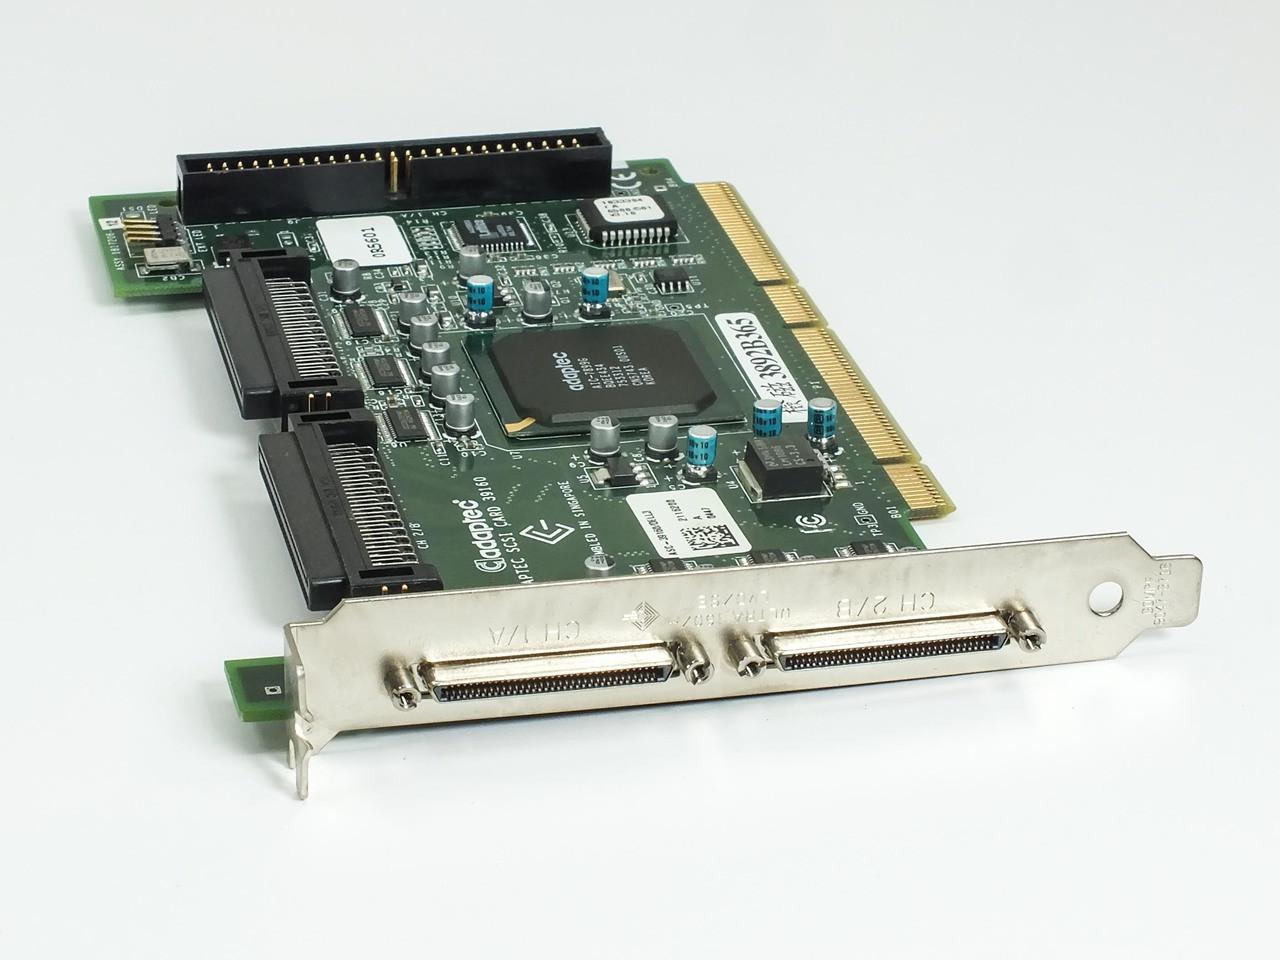 DRIVER: ADAPTEC SCSI CARD 39160 ULTRA160